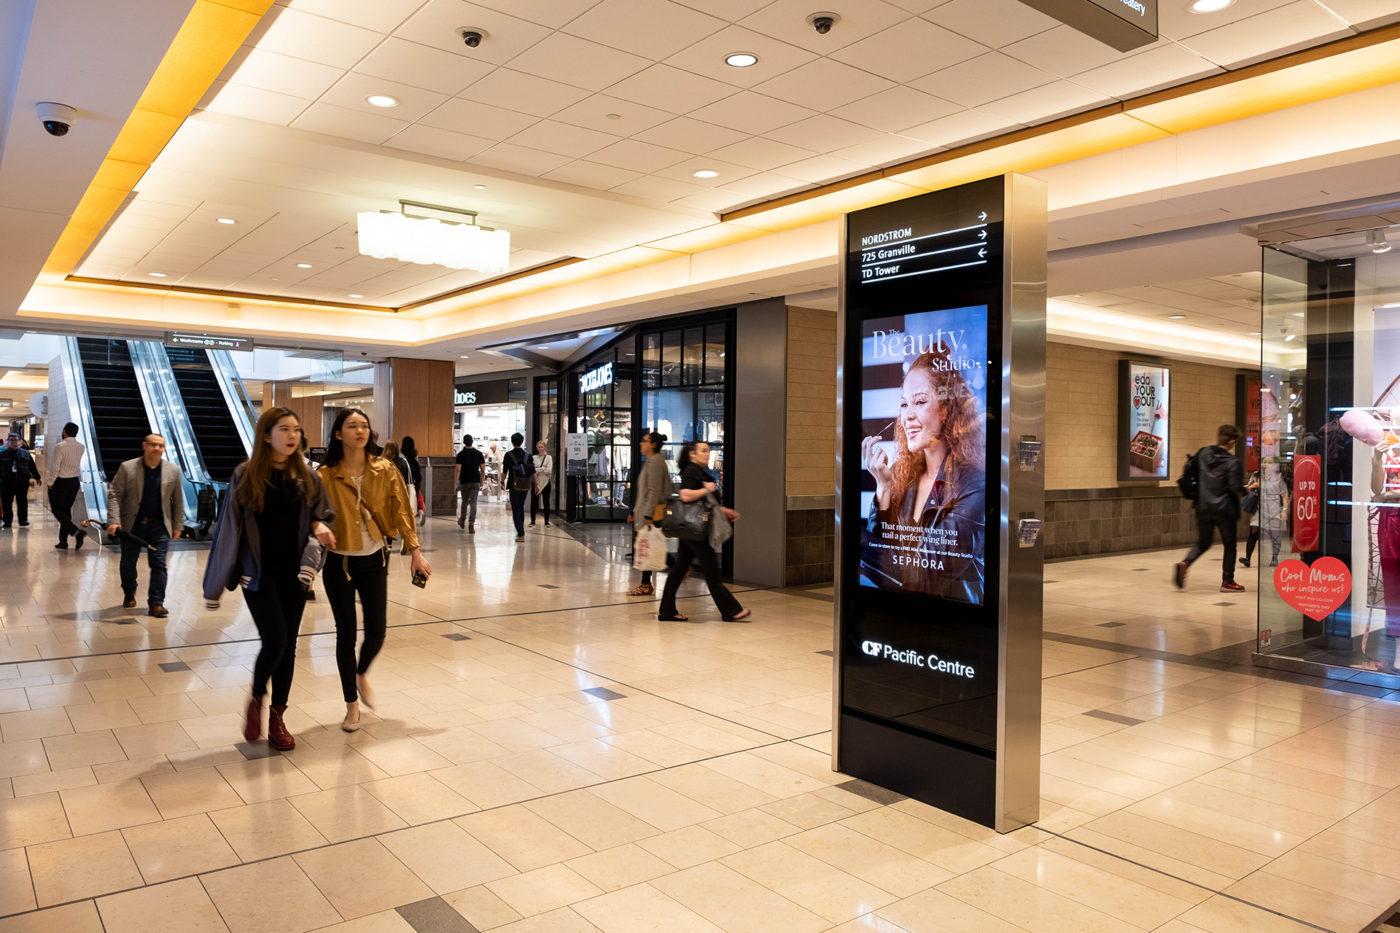 Sephora - The Beauty Studio - Malls - CF Pacific Mall - Digital Directory (Markham, Ontario)